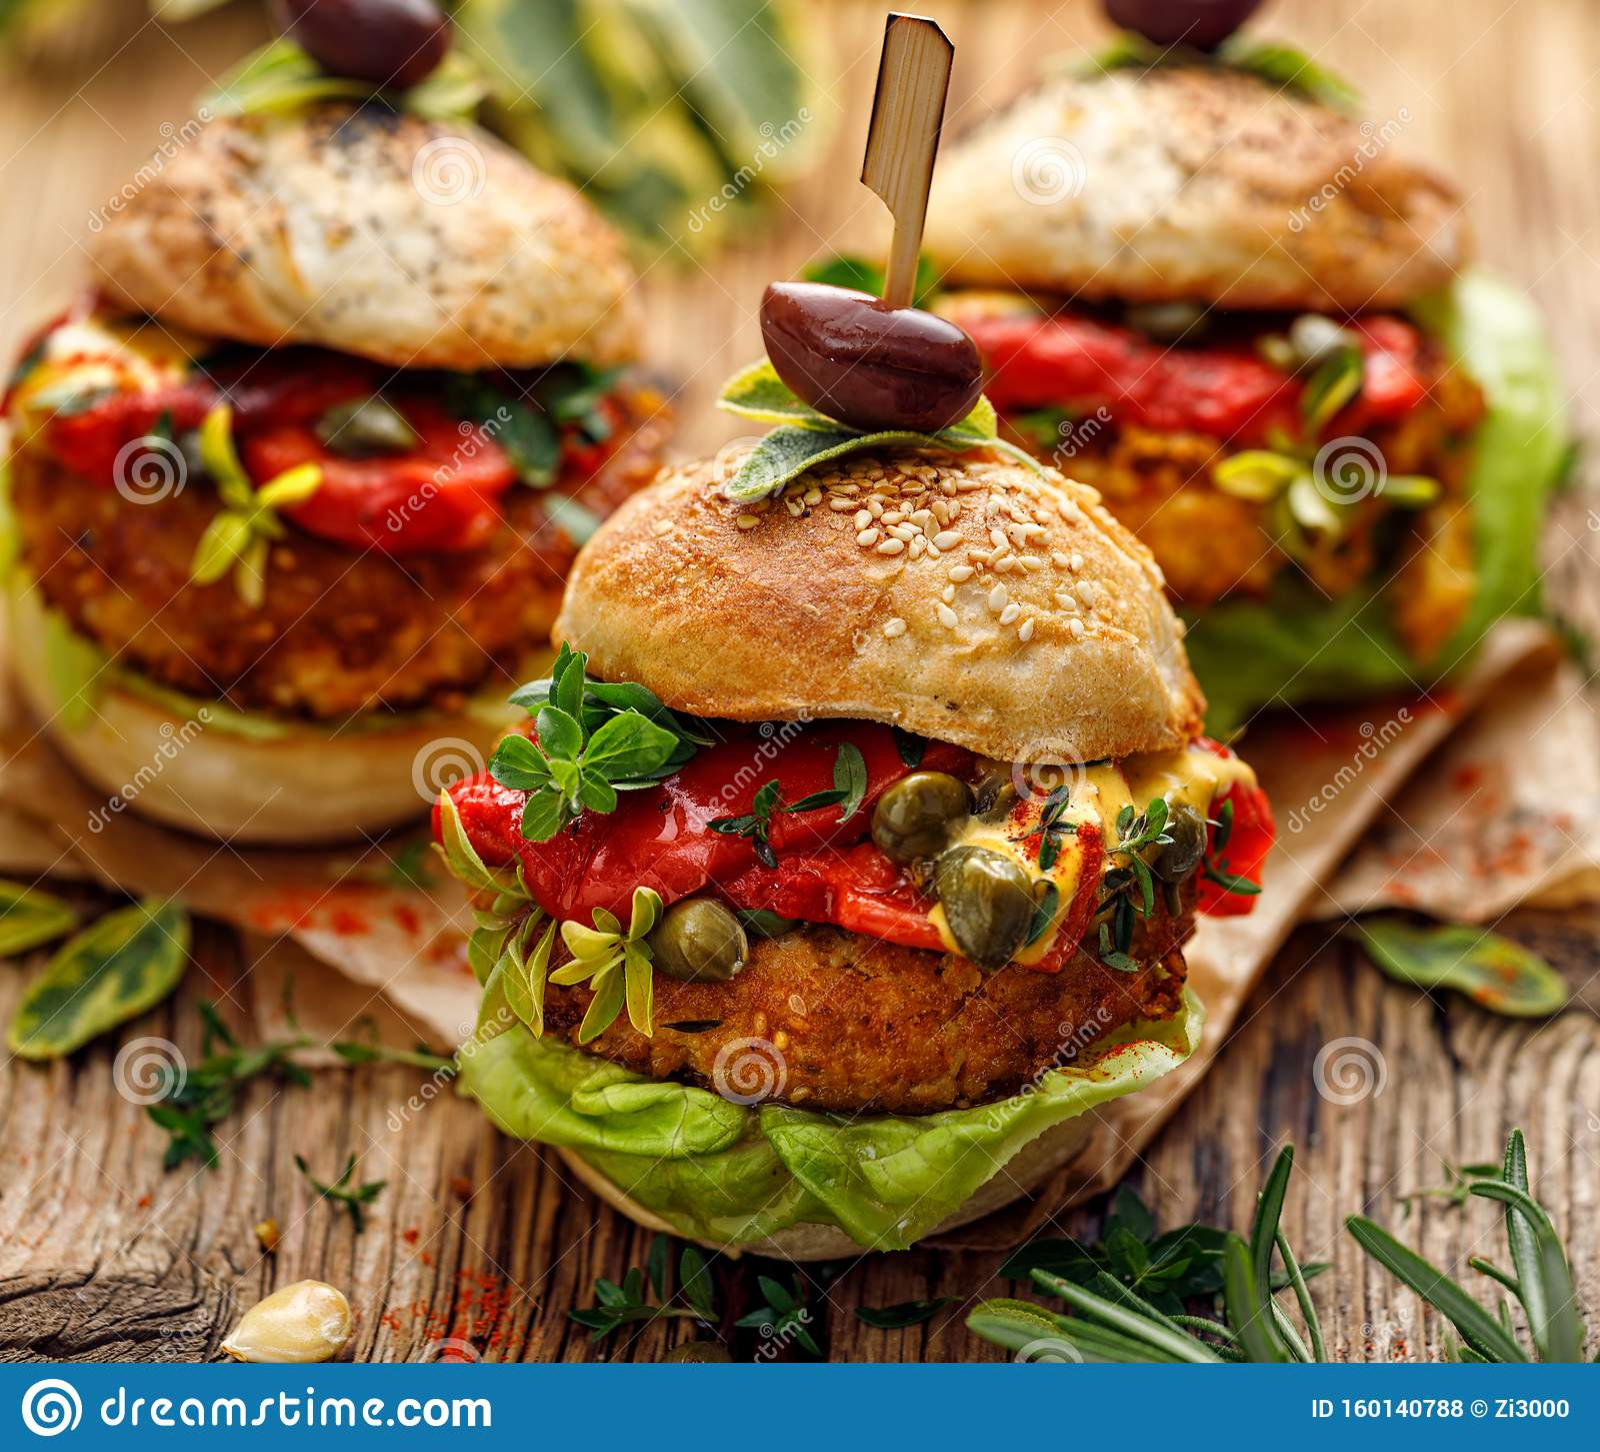 Burger di verdura, hamburger di manichino con aggiunta di peperoni grigliati, lattuga, erbe fresche e capperi